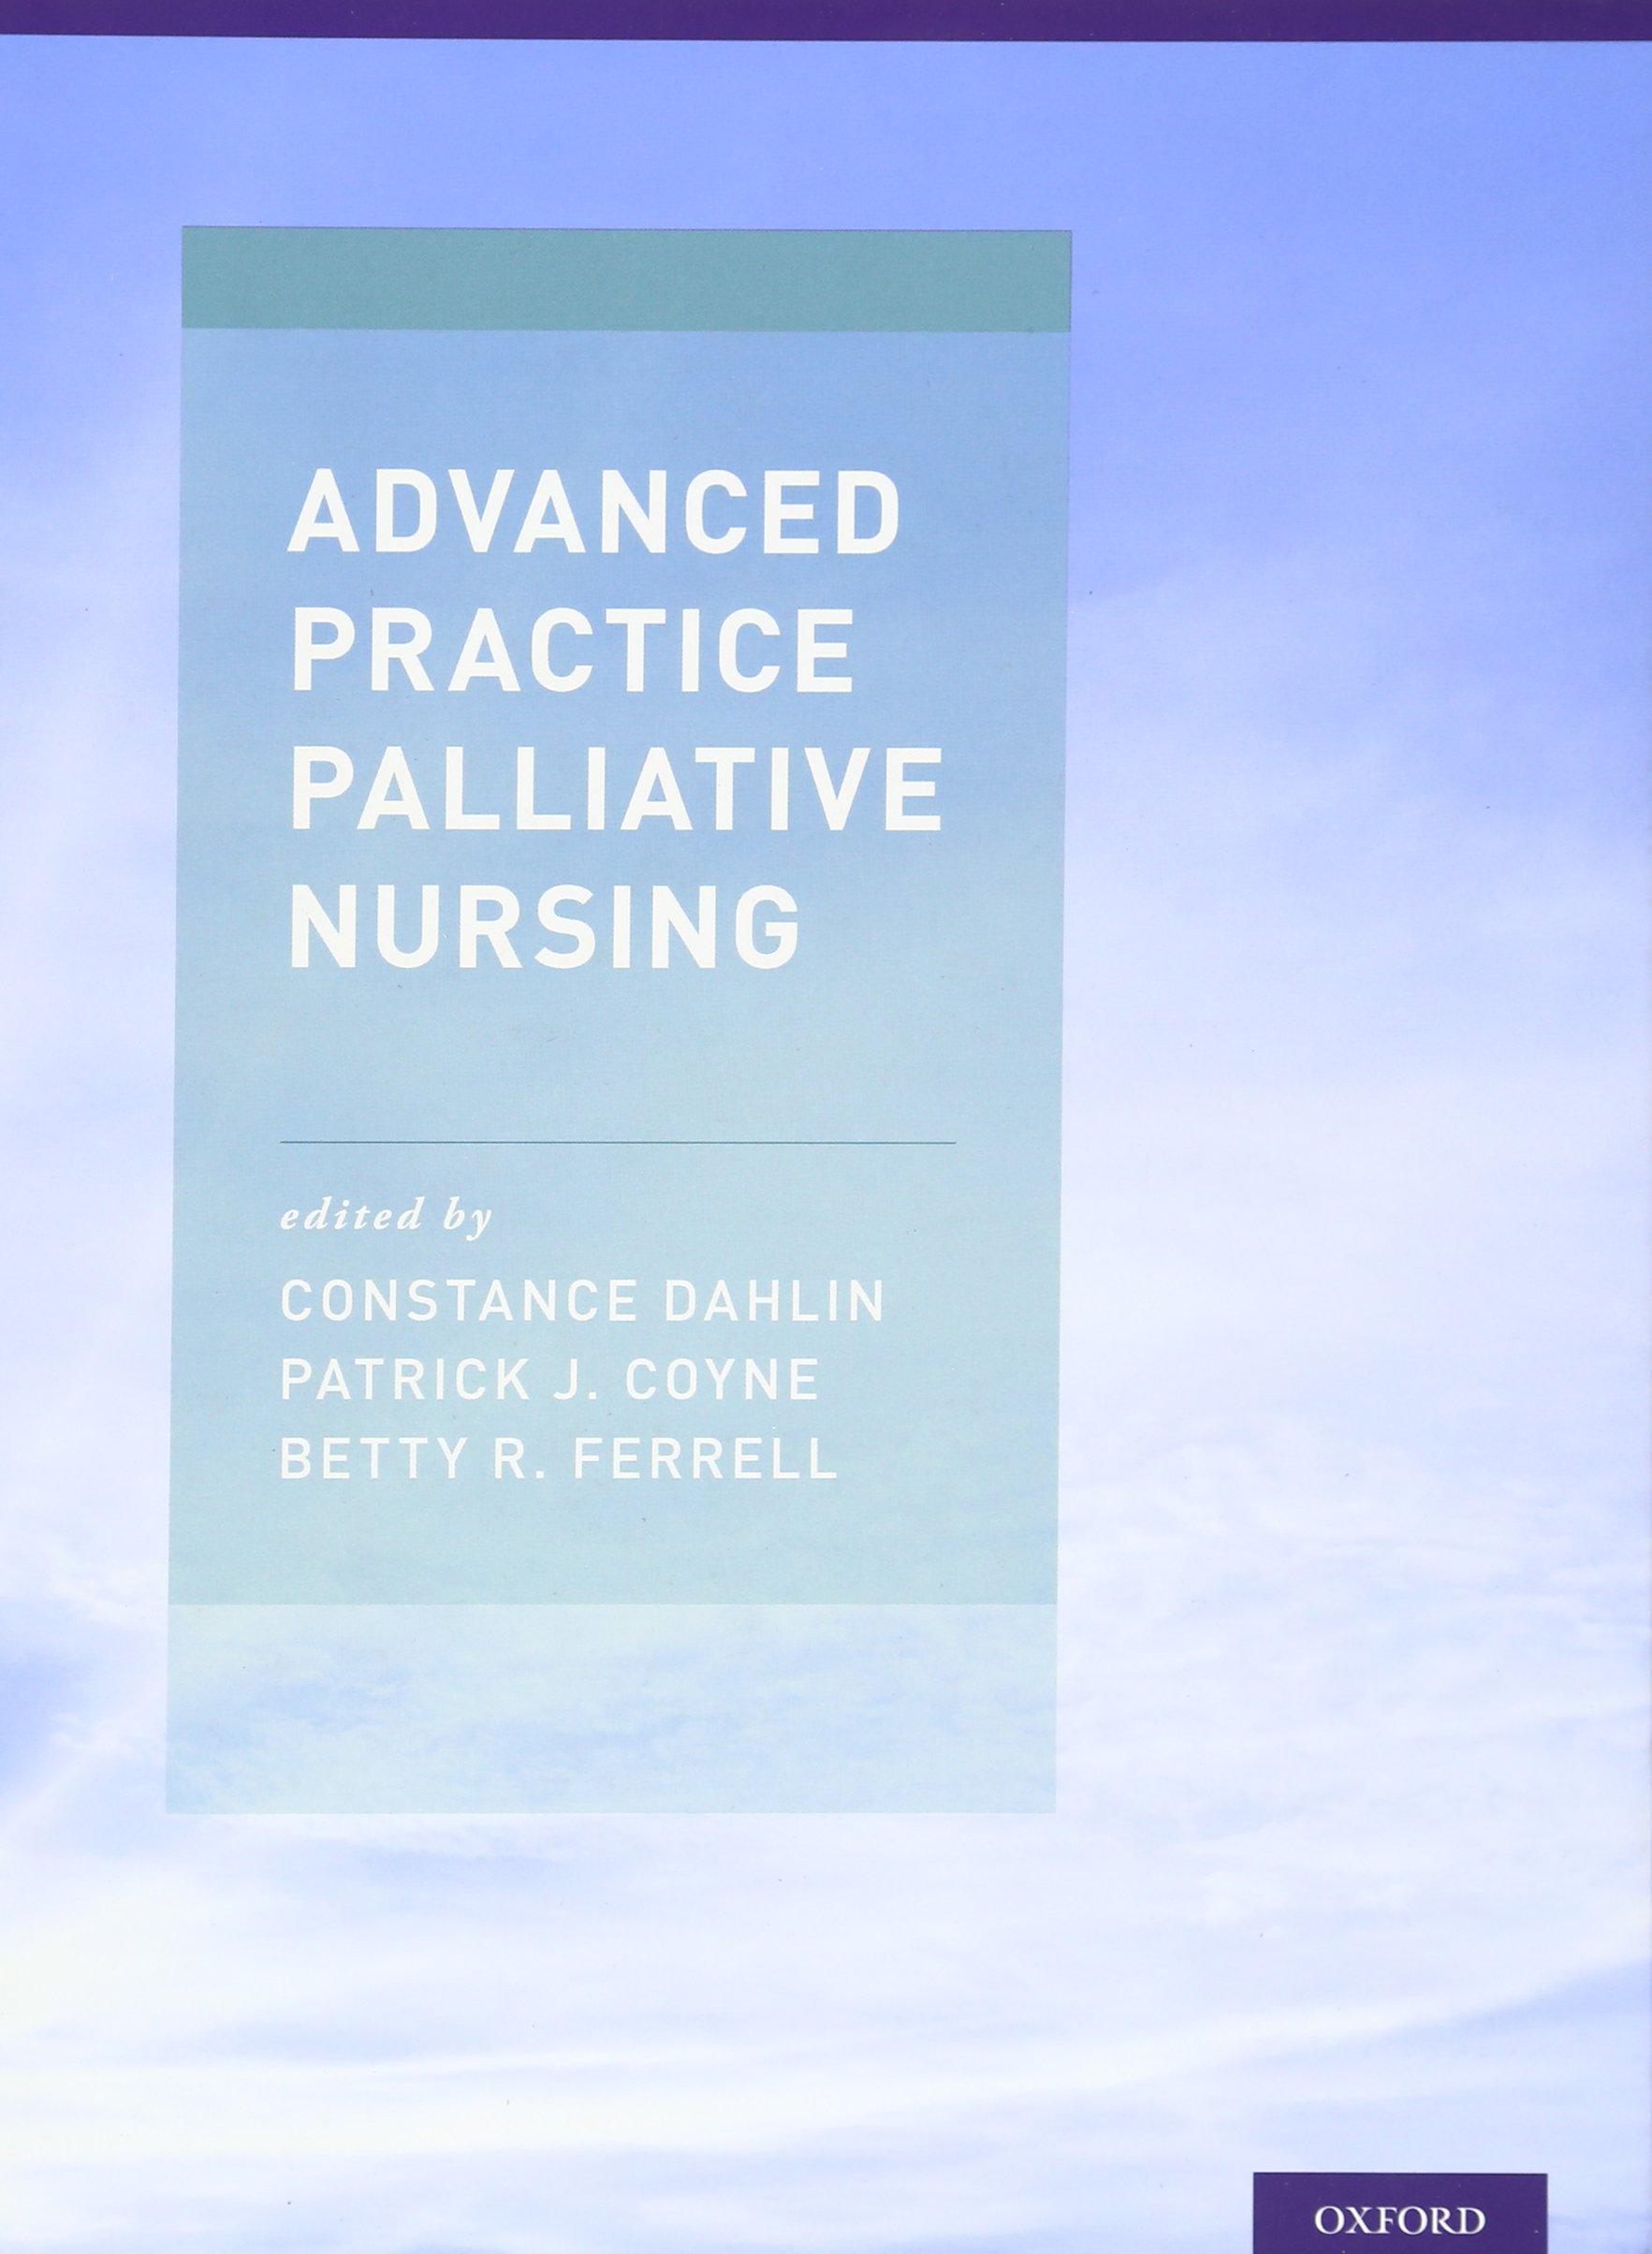 Advanced Practice Palliative Nursing by Oxford University Press